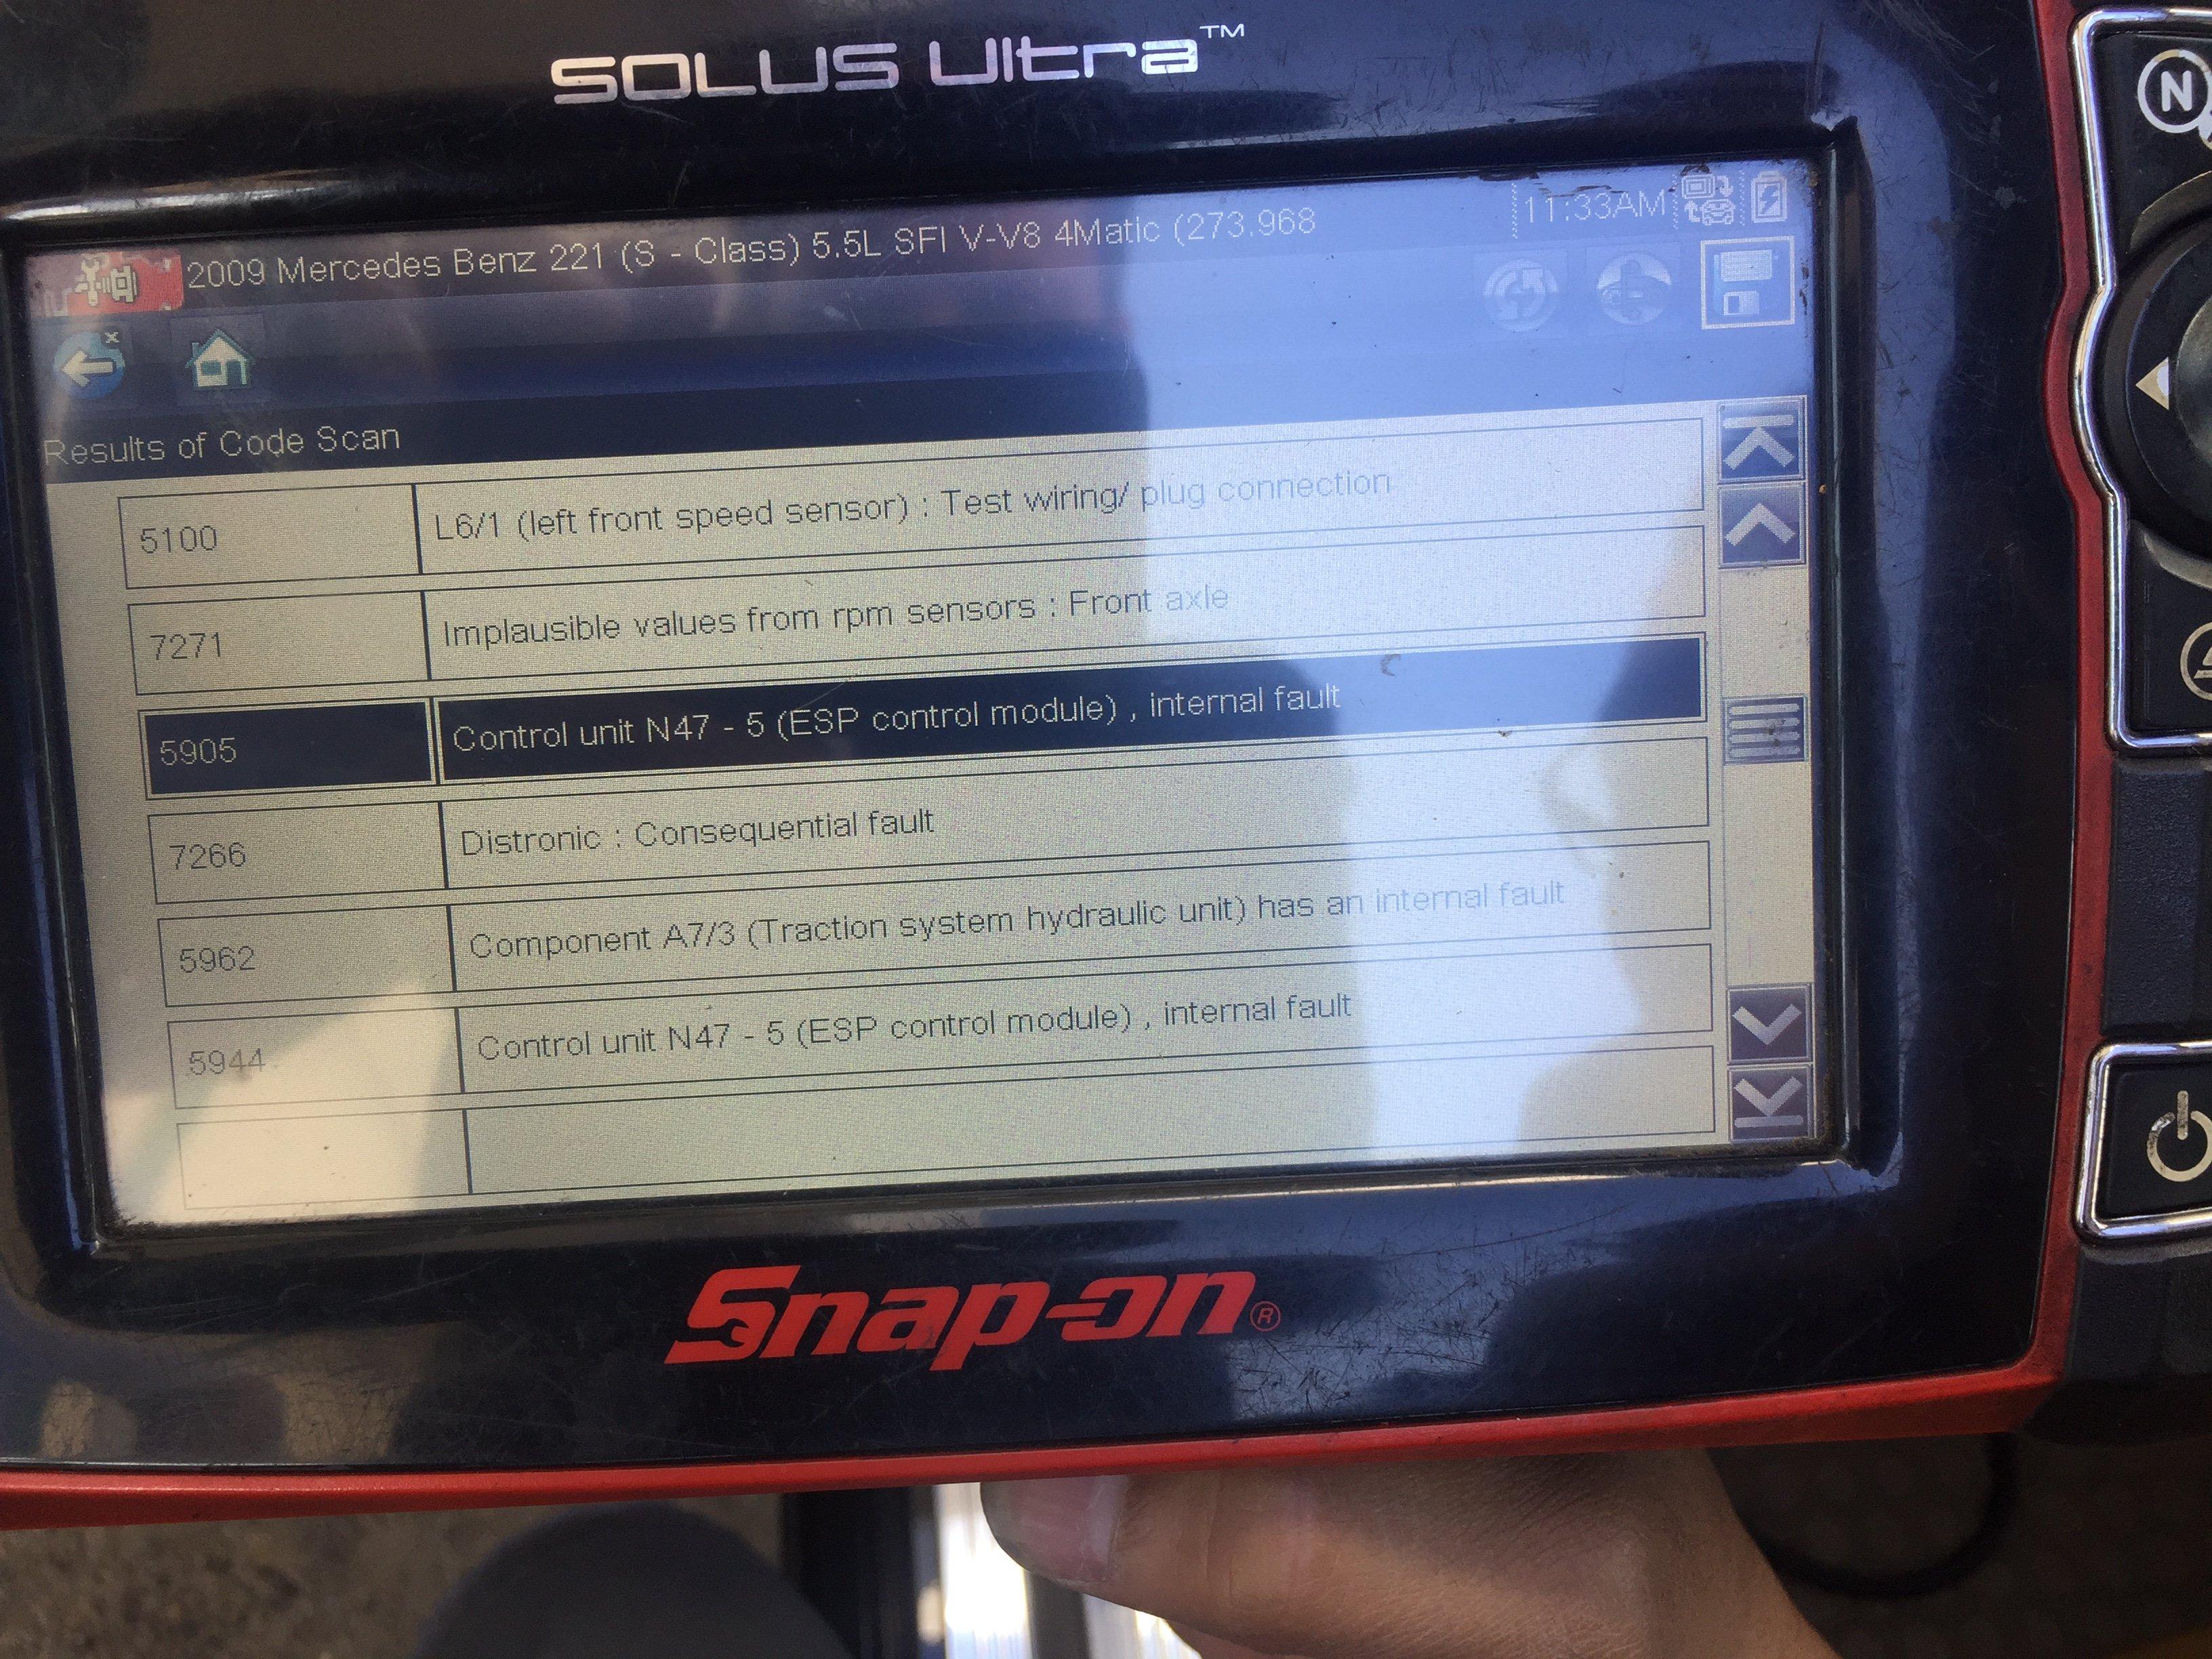 S550 09 esp error heavey ateering error 5905  Error 5905 control